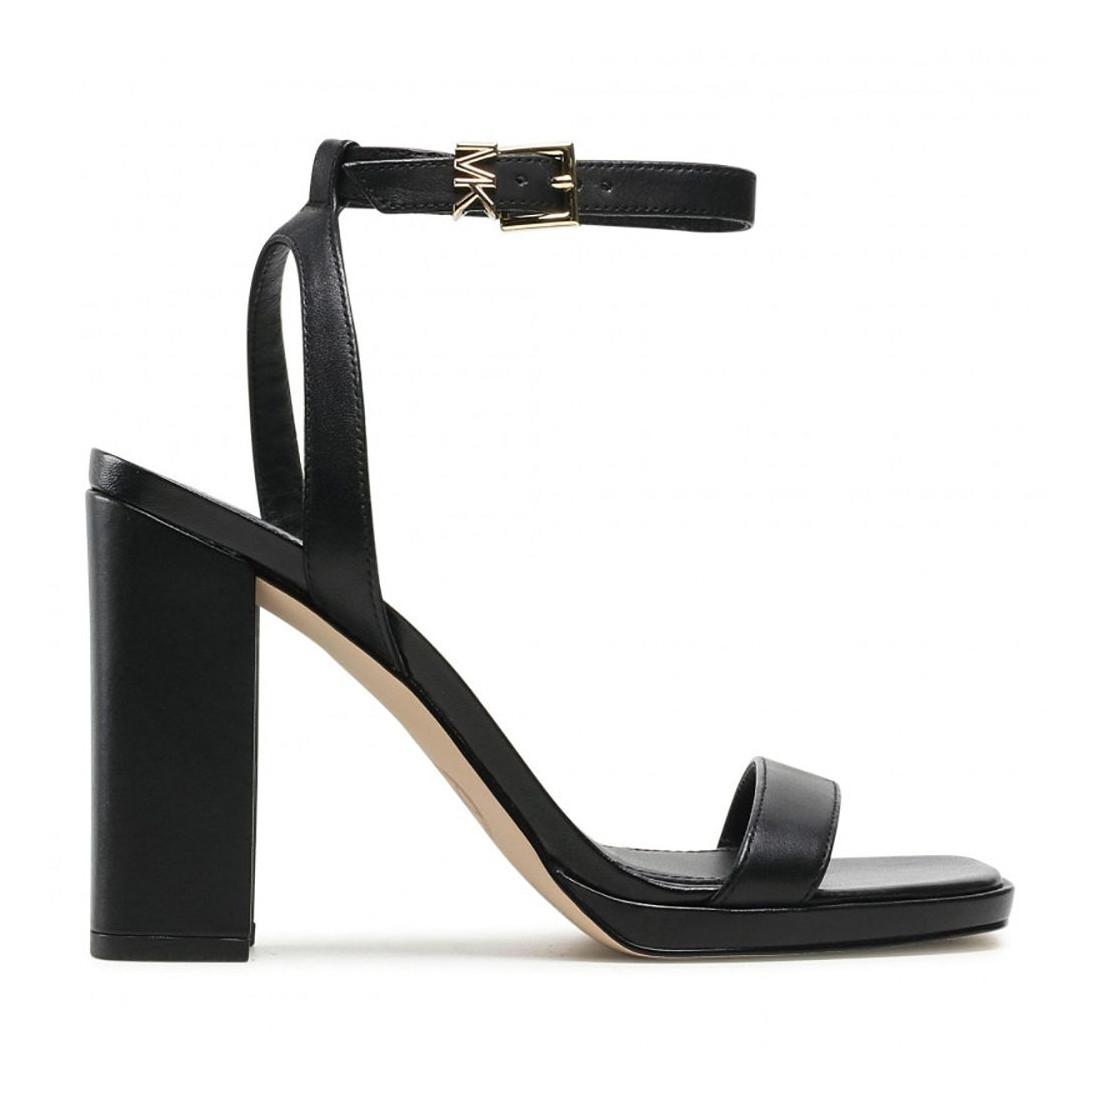 sandals woman michael kors 40s1anhs3l001 8594